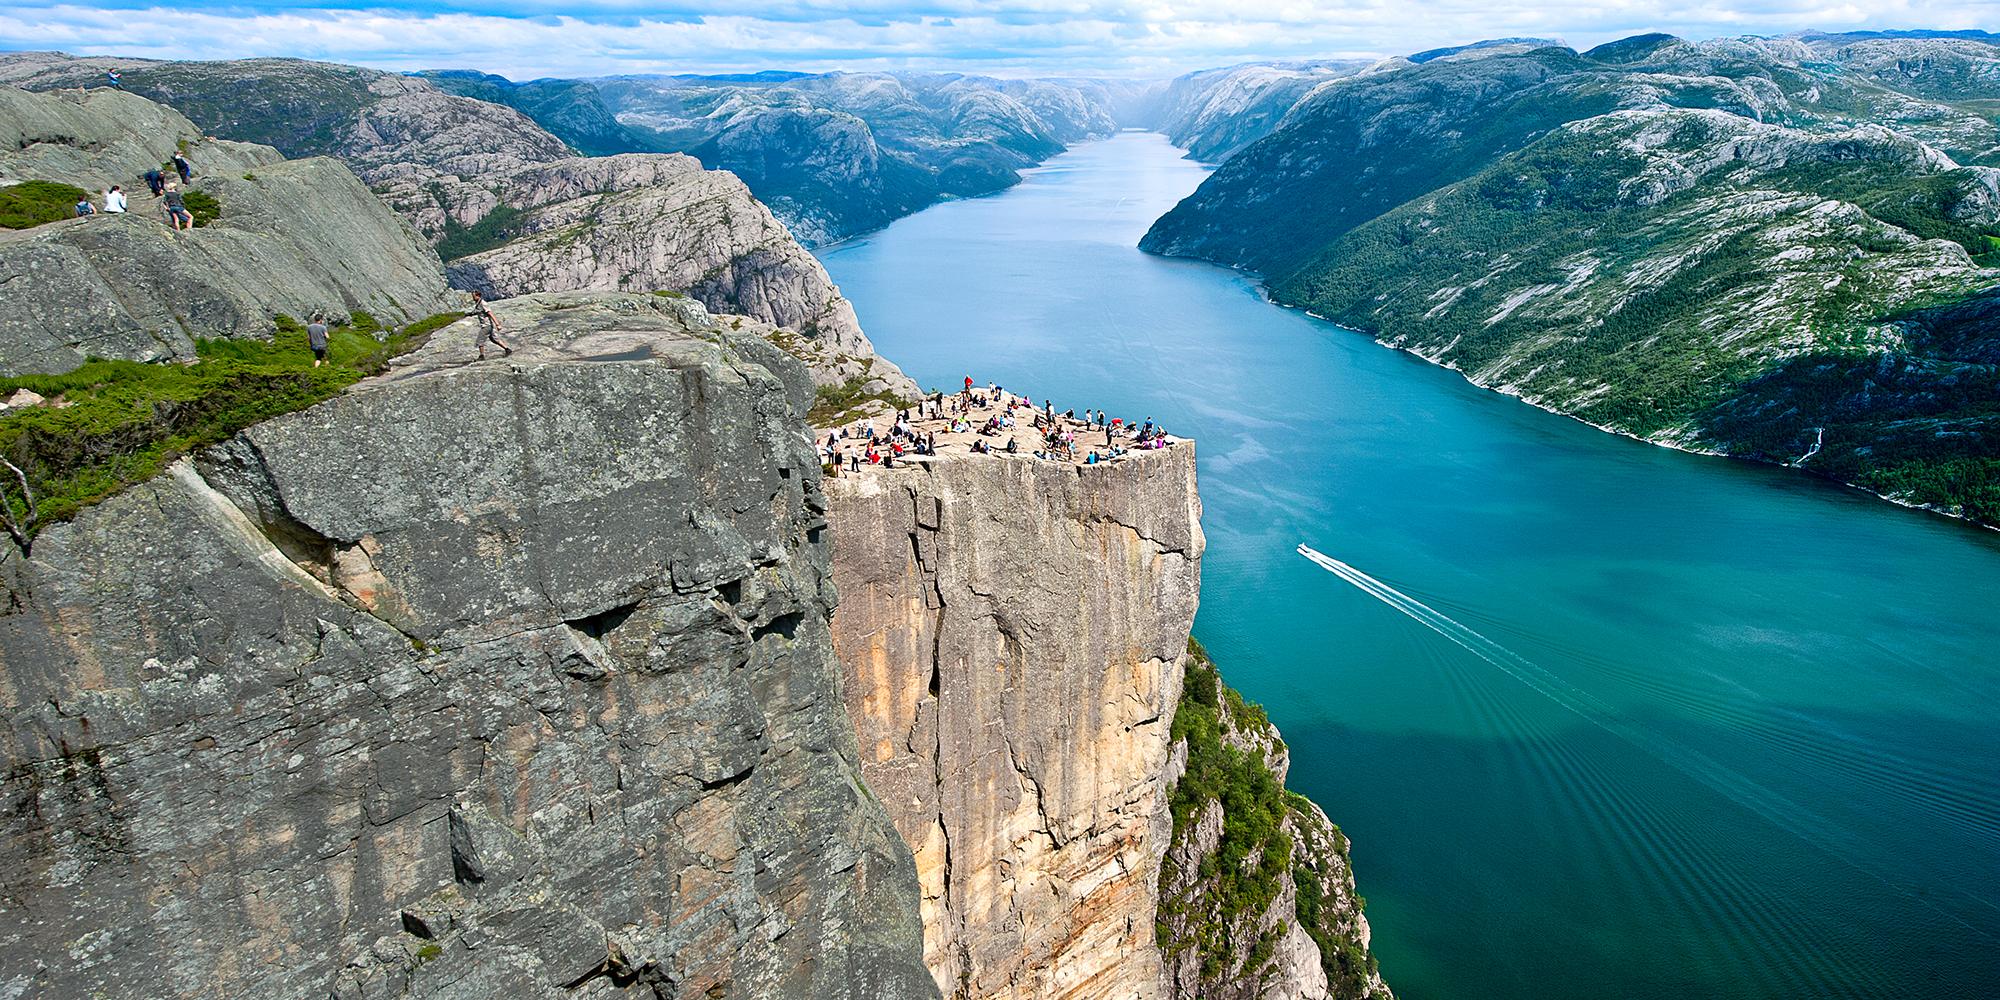 damer i norge Stavanger